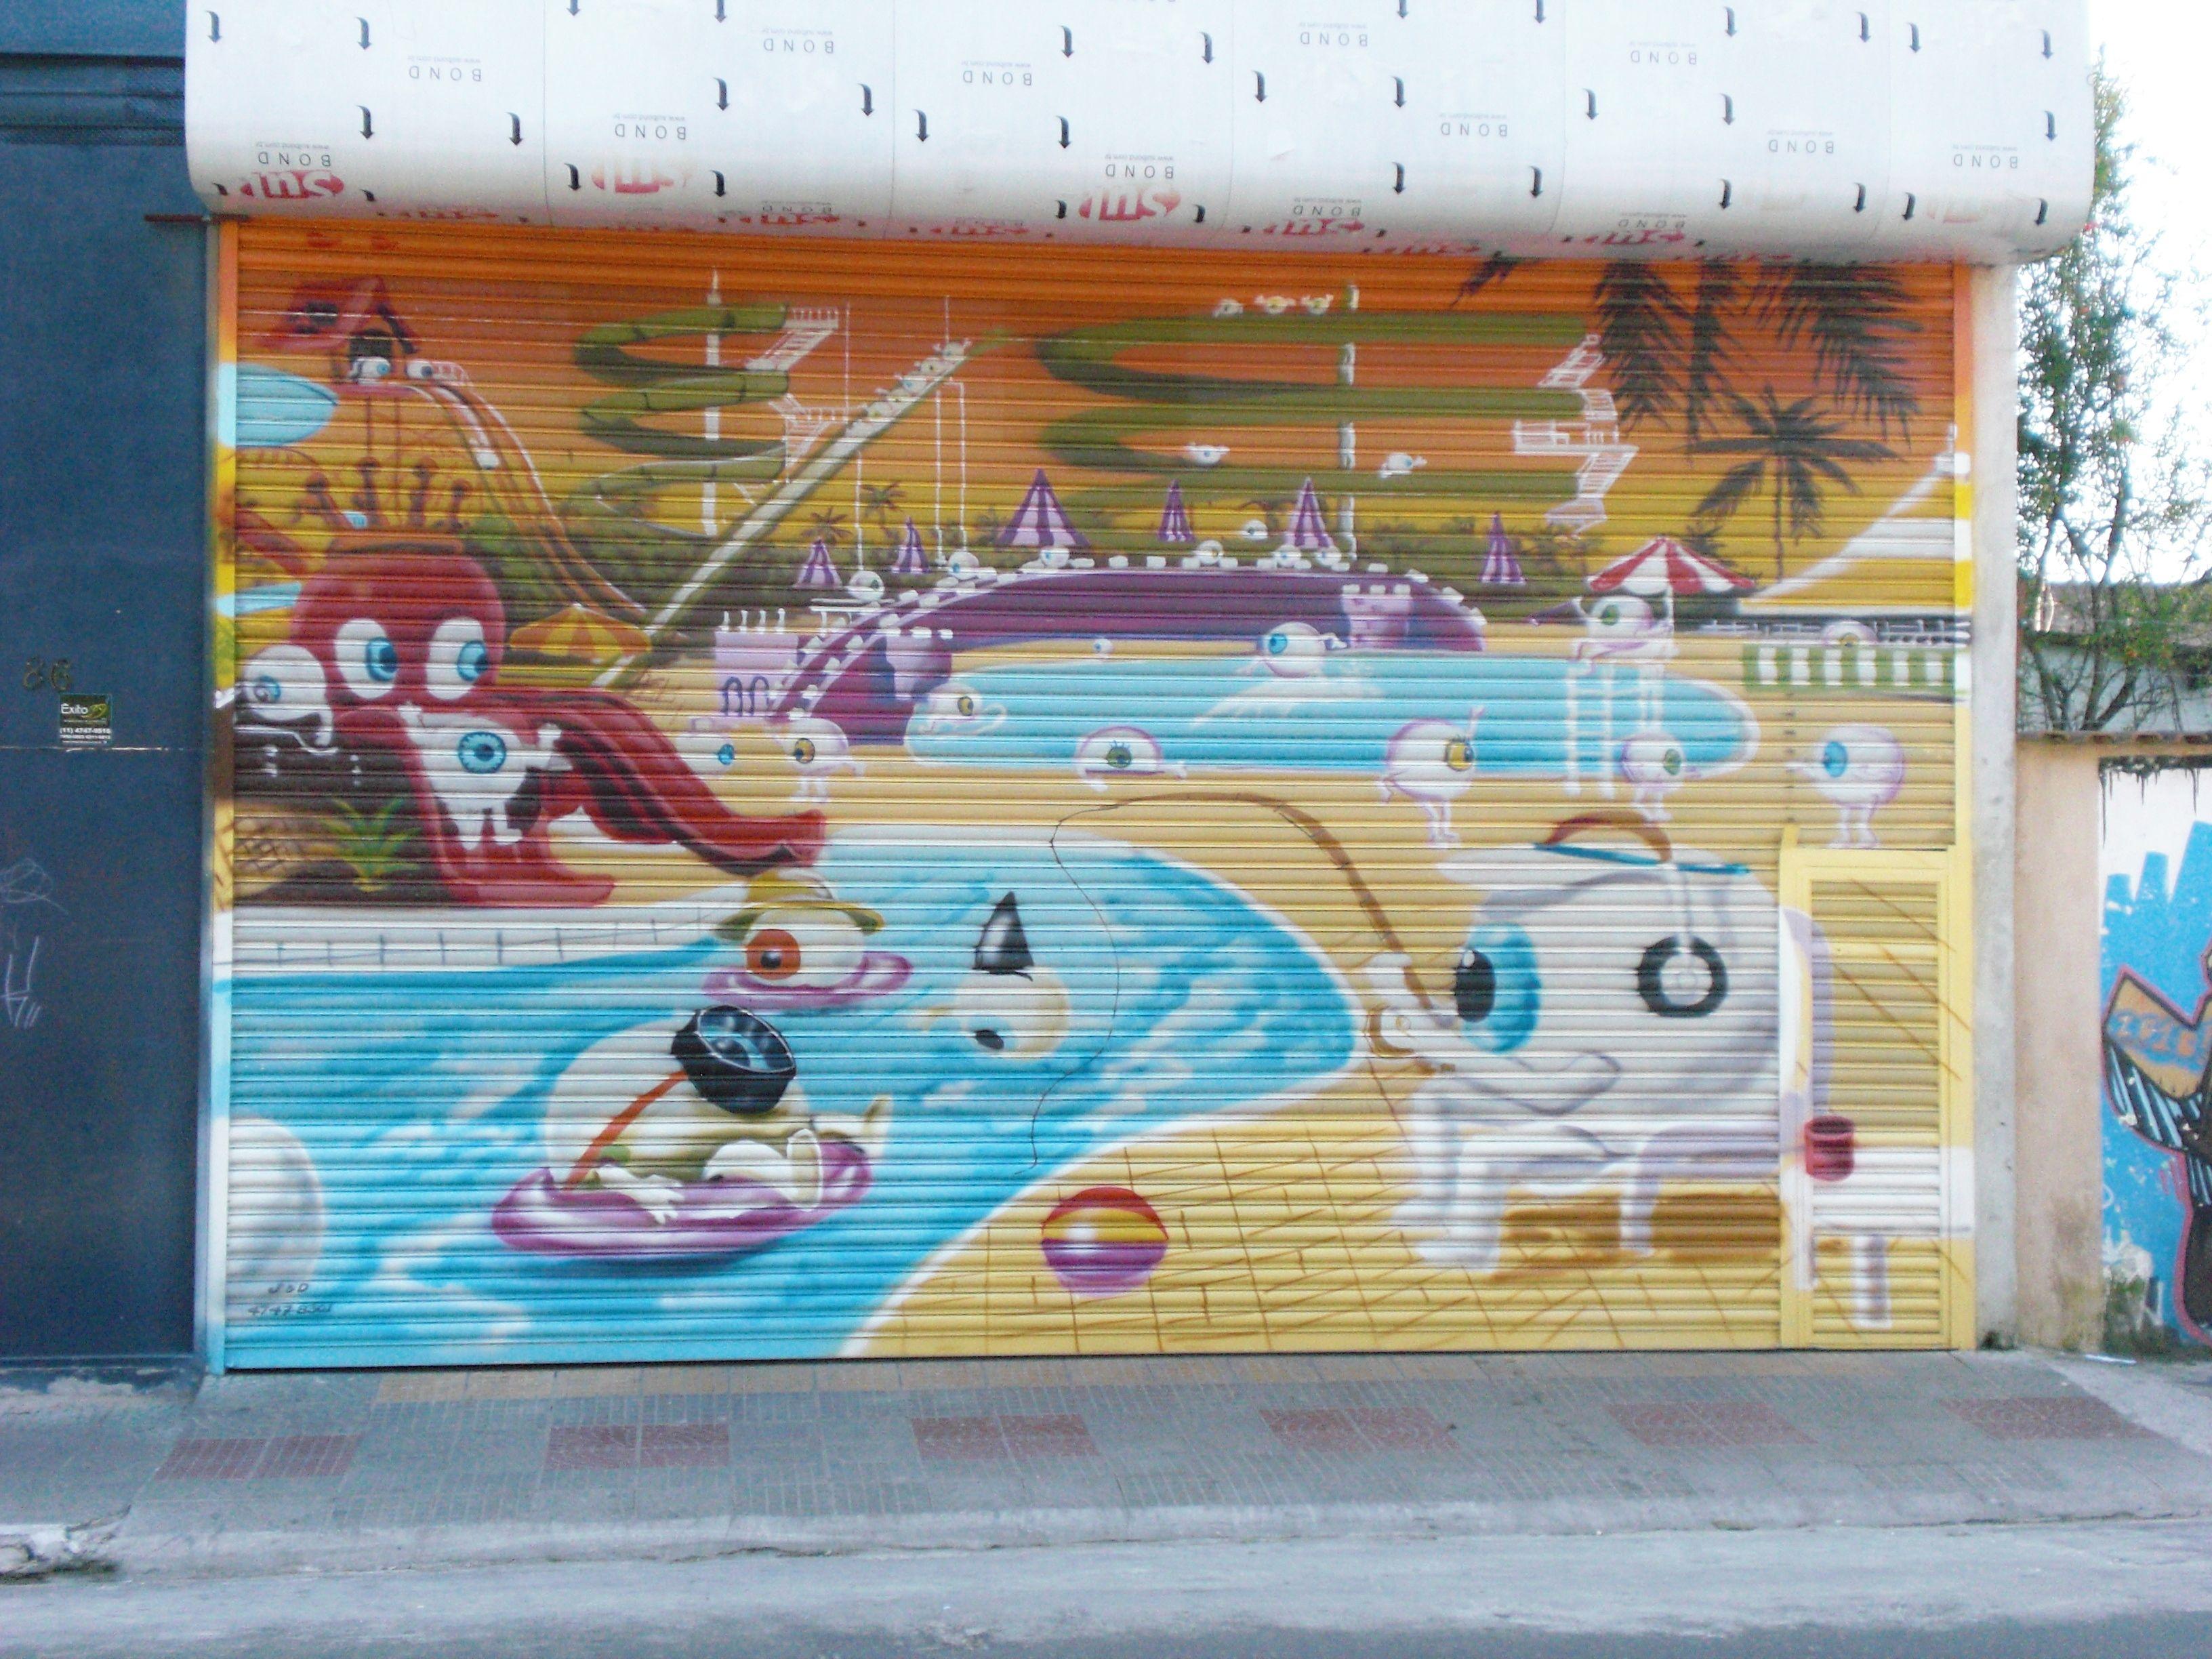 Spray Paint Graffiti Public Art Visual Art Created In Public Locations